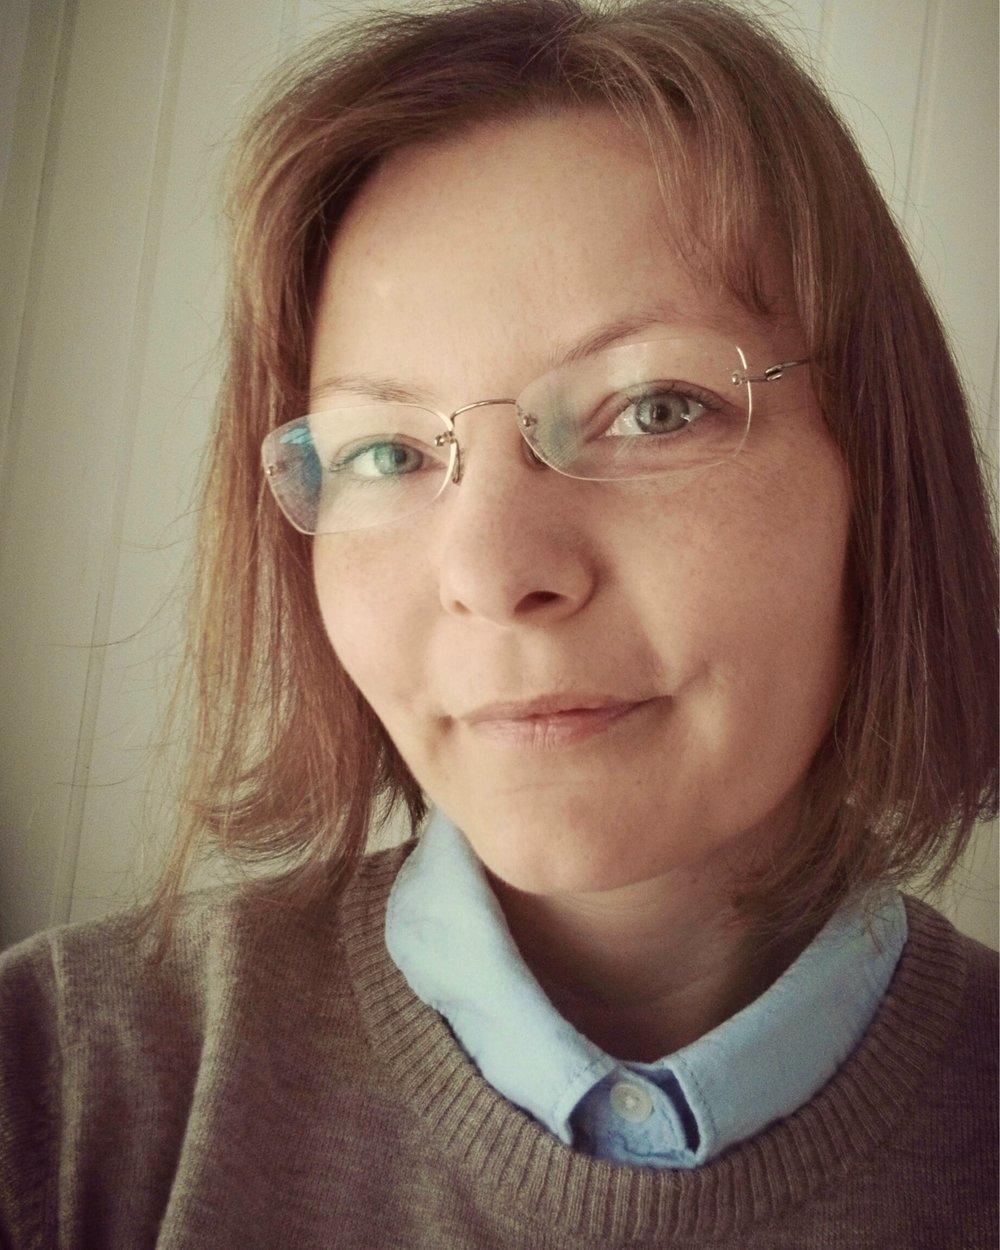 Trude Ersvik - Lærer / kunst & håndtv.Telefon: 934 91 293trudeersvik@bodalenfriskole.no